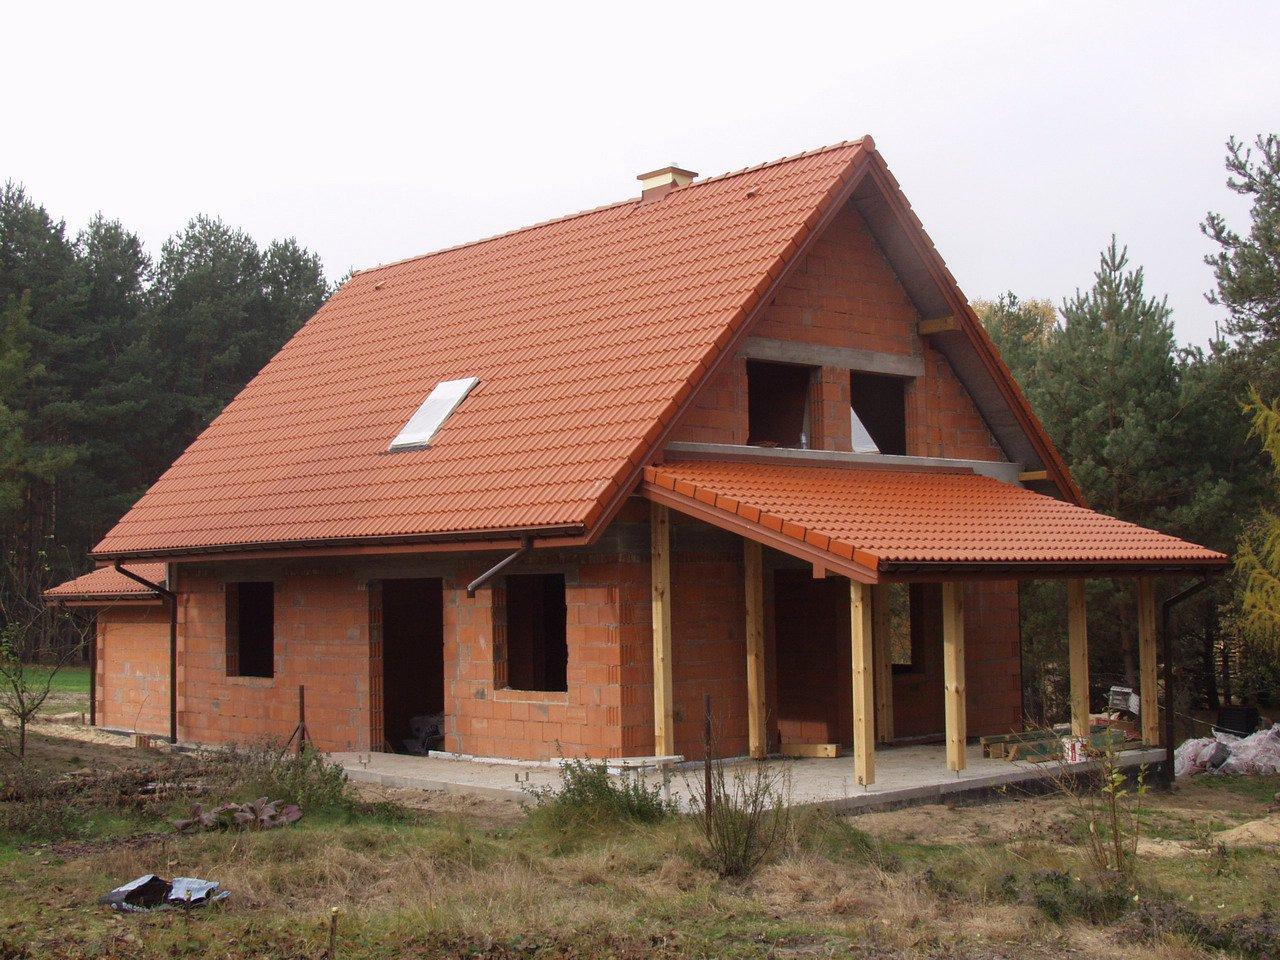 projekt-domu-lesny-zakatek-fot-9-1390379648-a034gilo.jpg